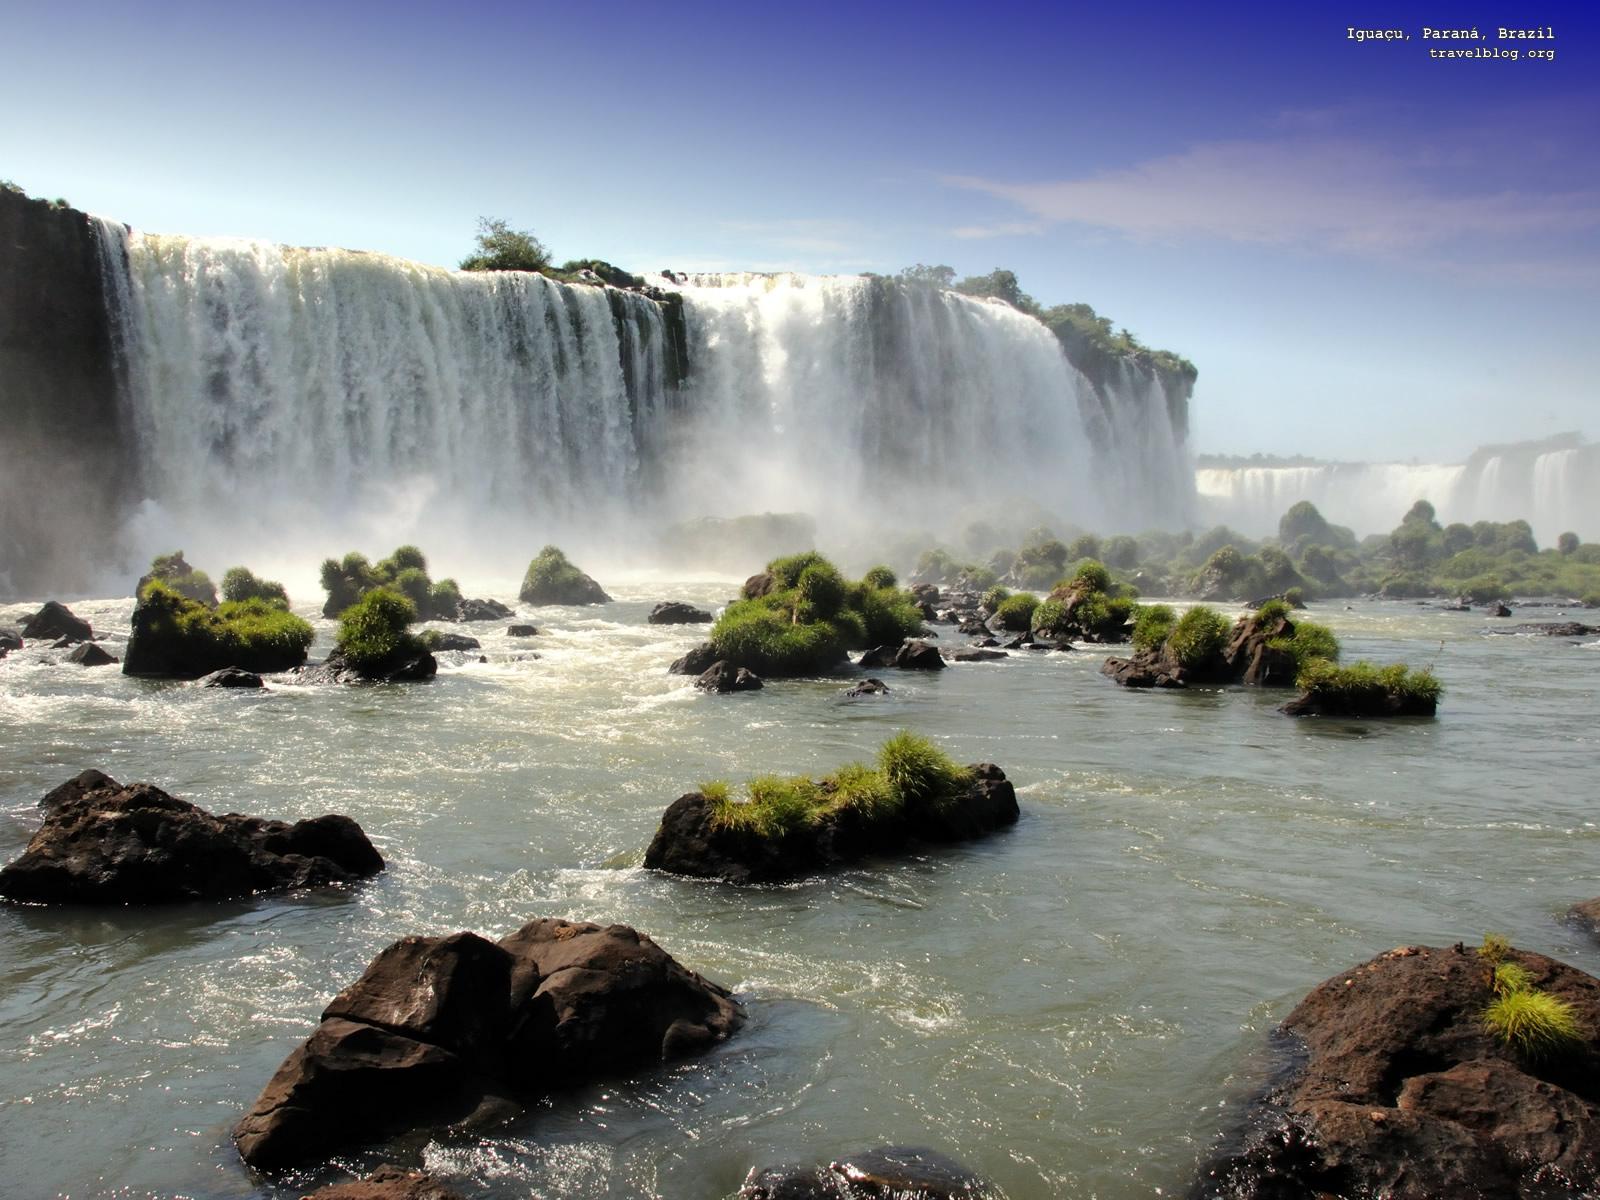 List of desktop Wallpapers matching the waterfall wallpapers 1600x1200